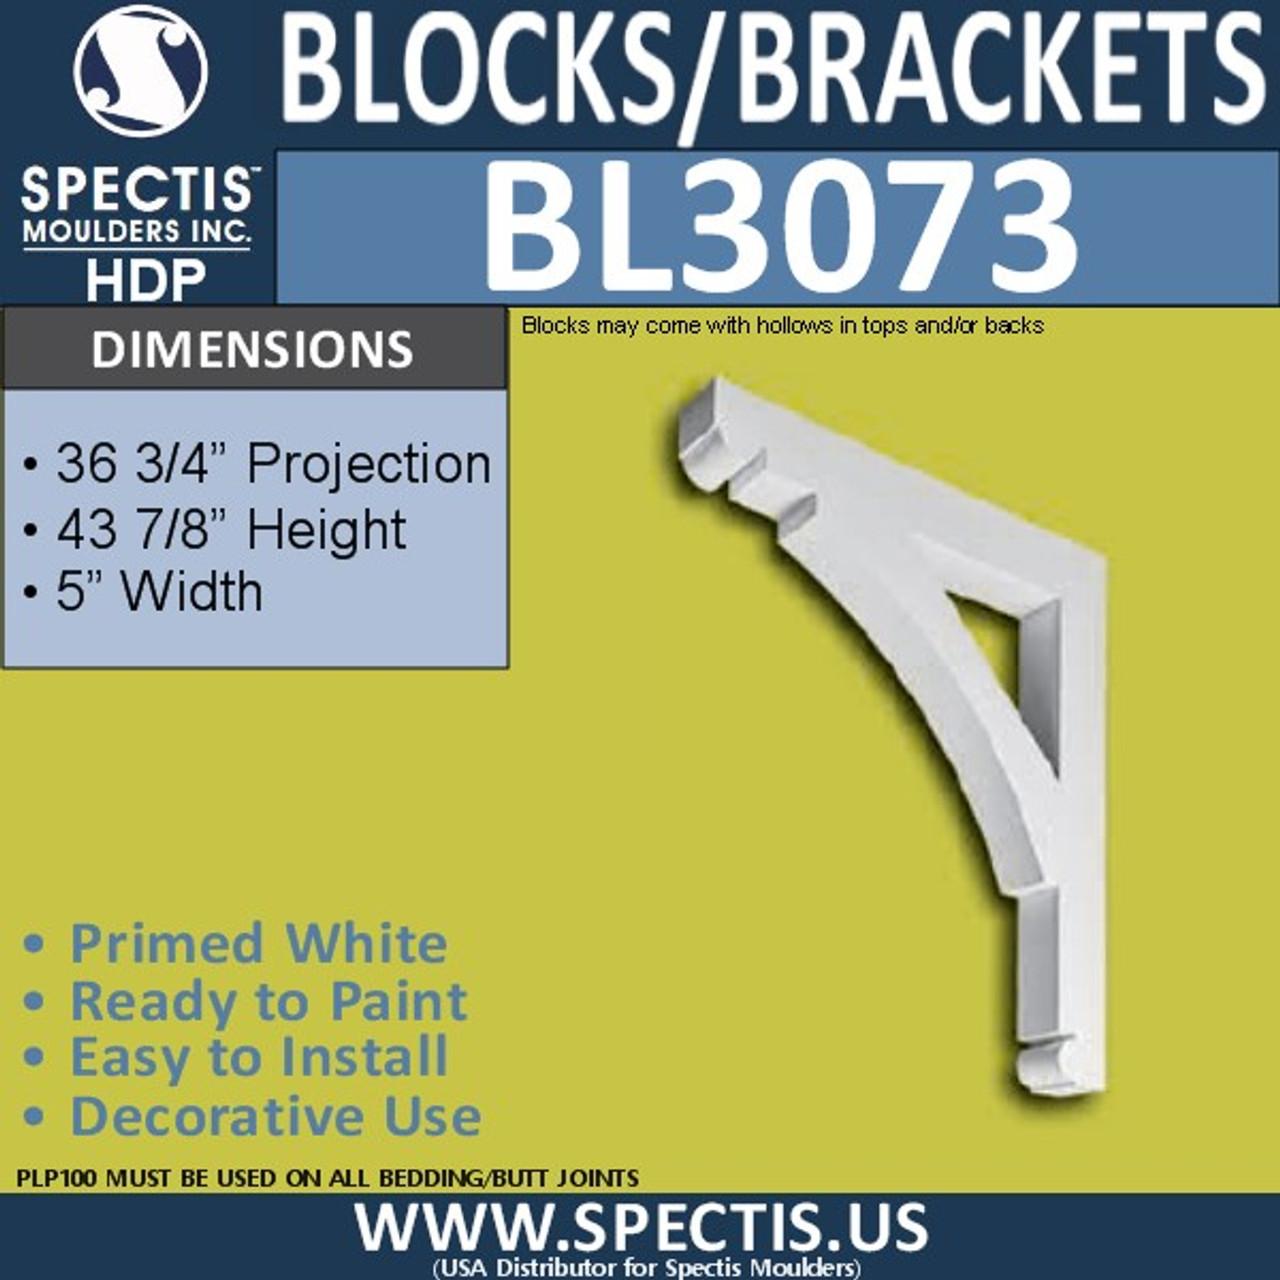 "BL3073 Eave Block or Bracket 5""W x 44""H x 36.75"" P"